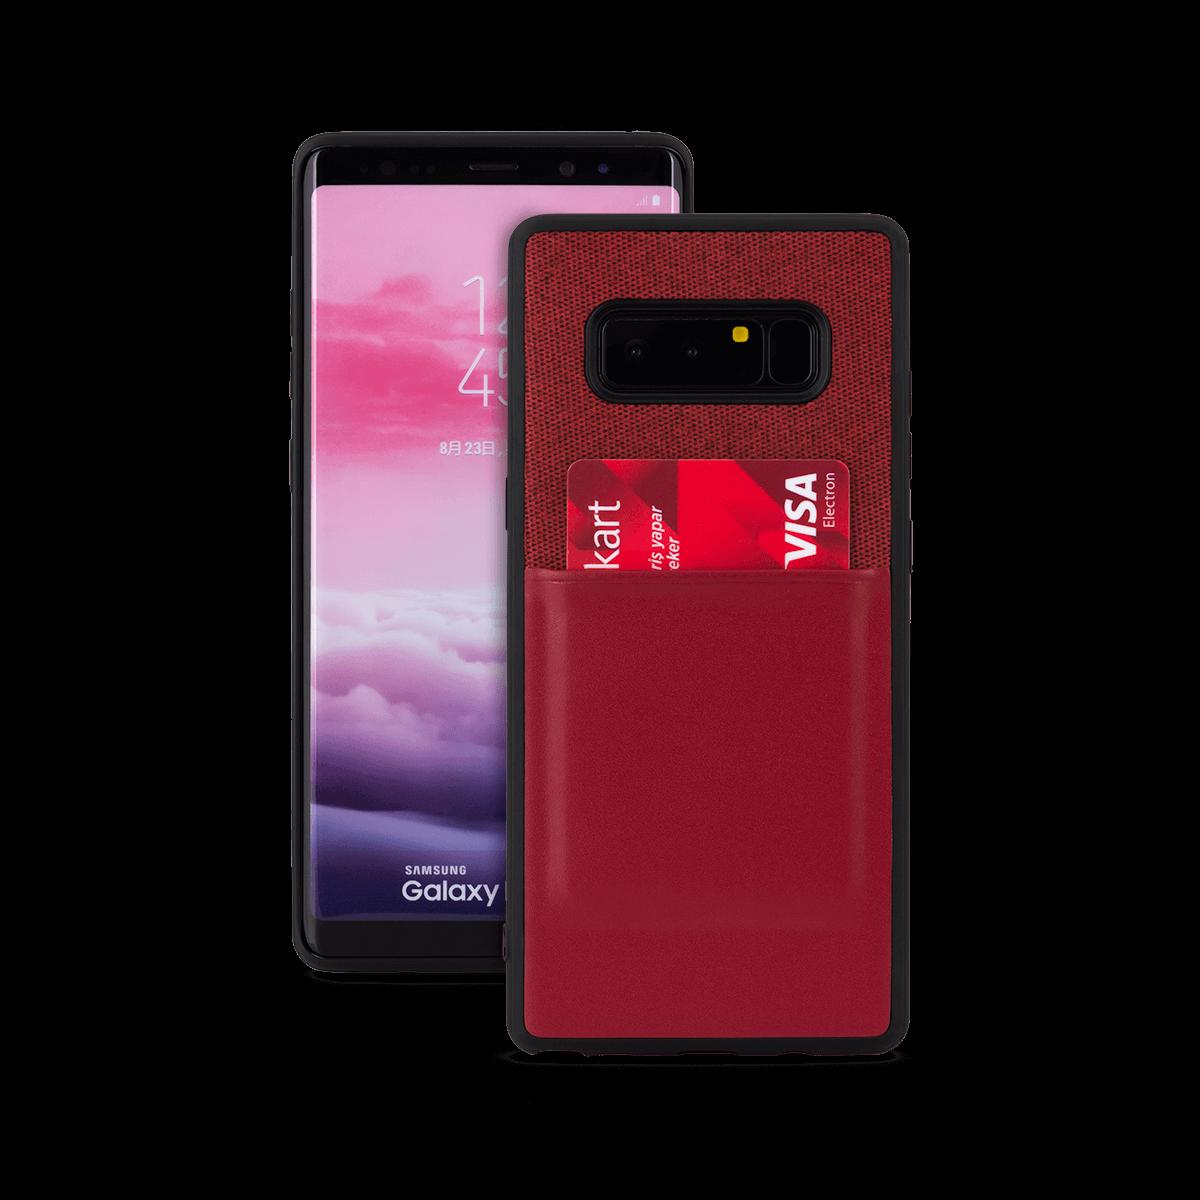 Samsung Note 8 için spada Fashion Pocket Kırmızı renkli kapak